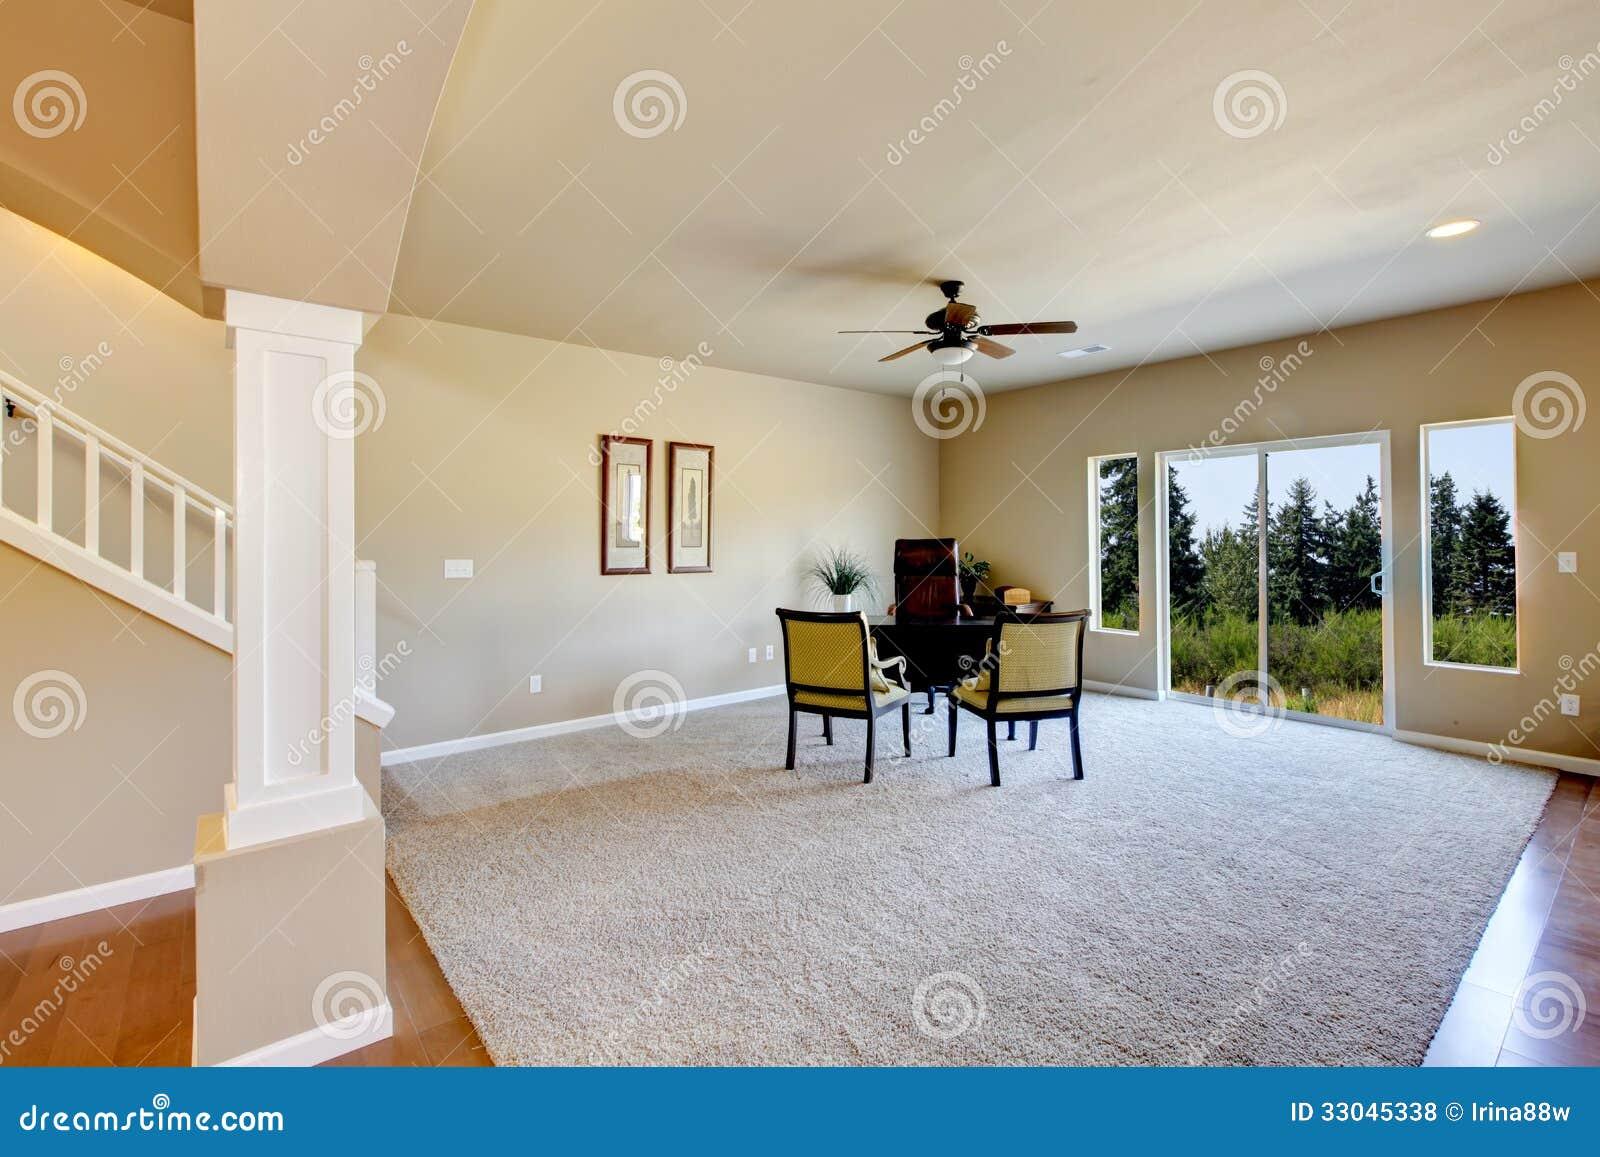 Nytt tomt rum med beige matta. royaltyfria foton   bild: 33045338